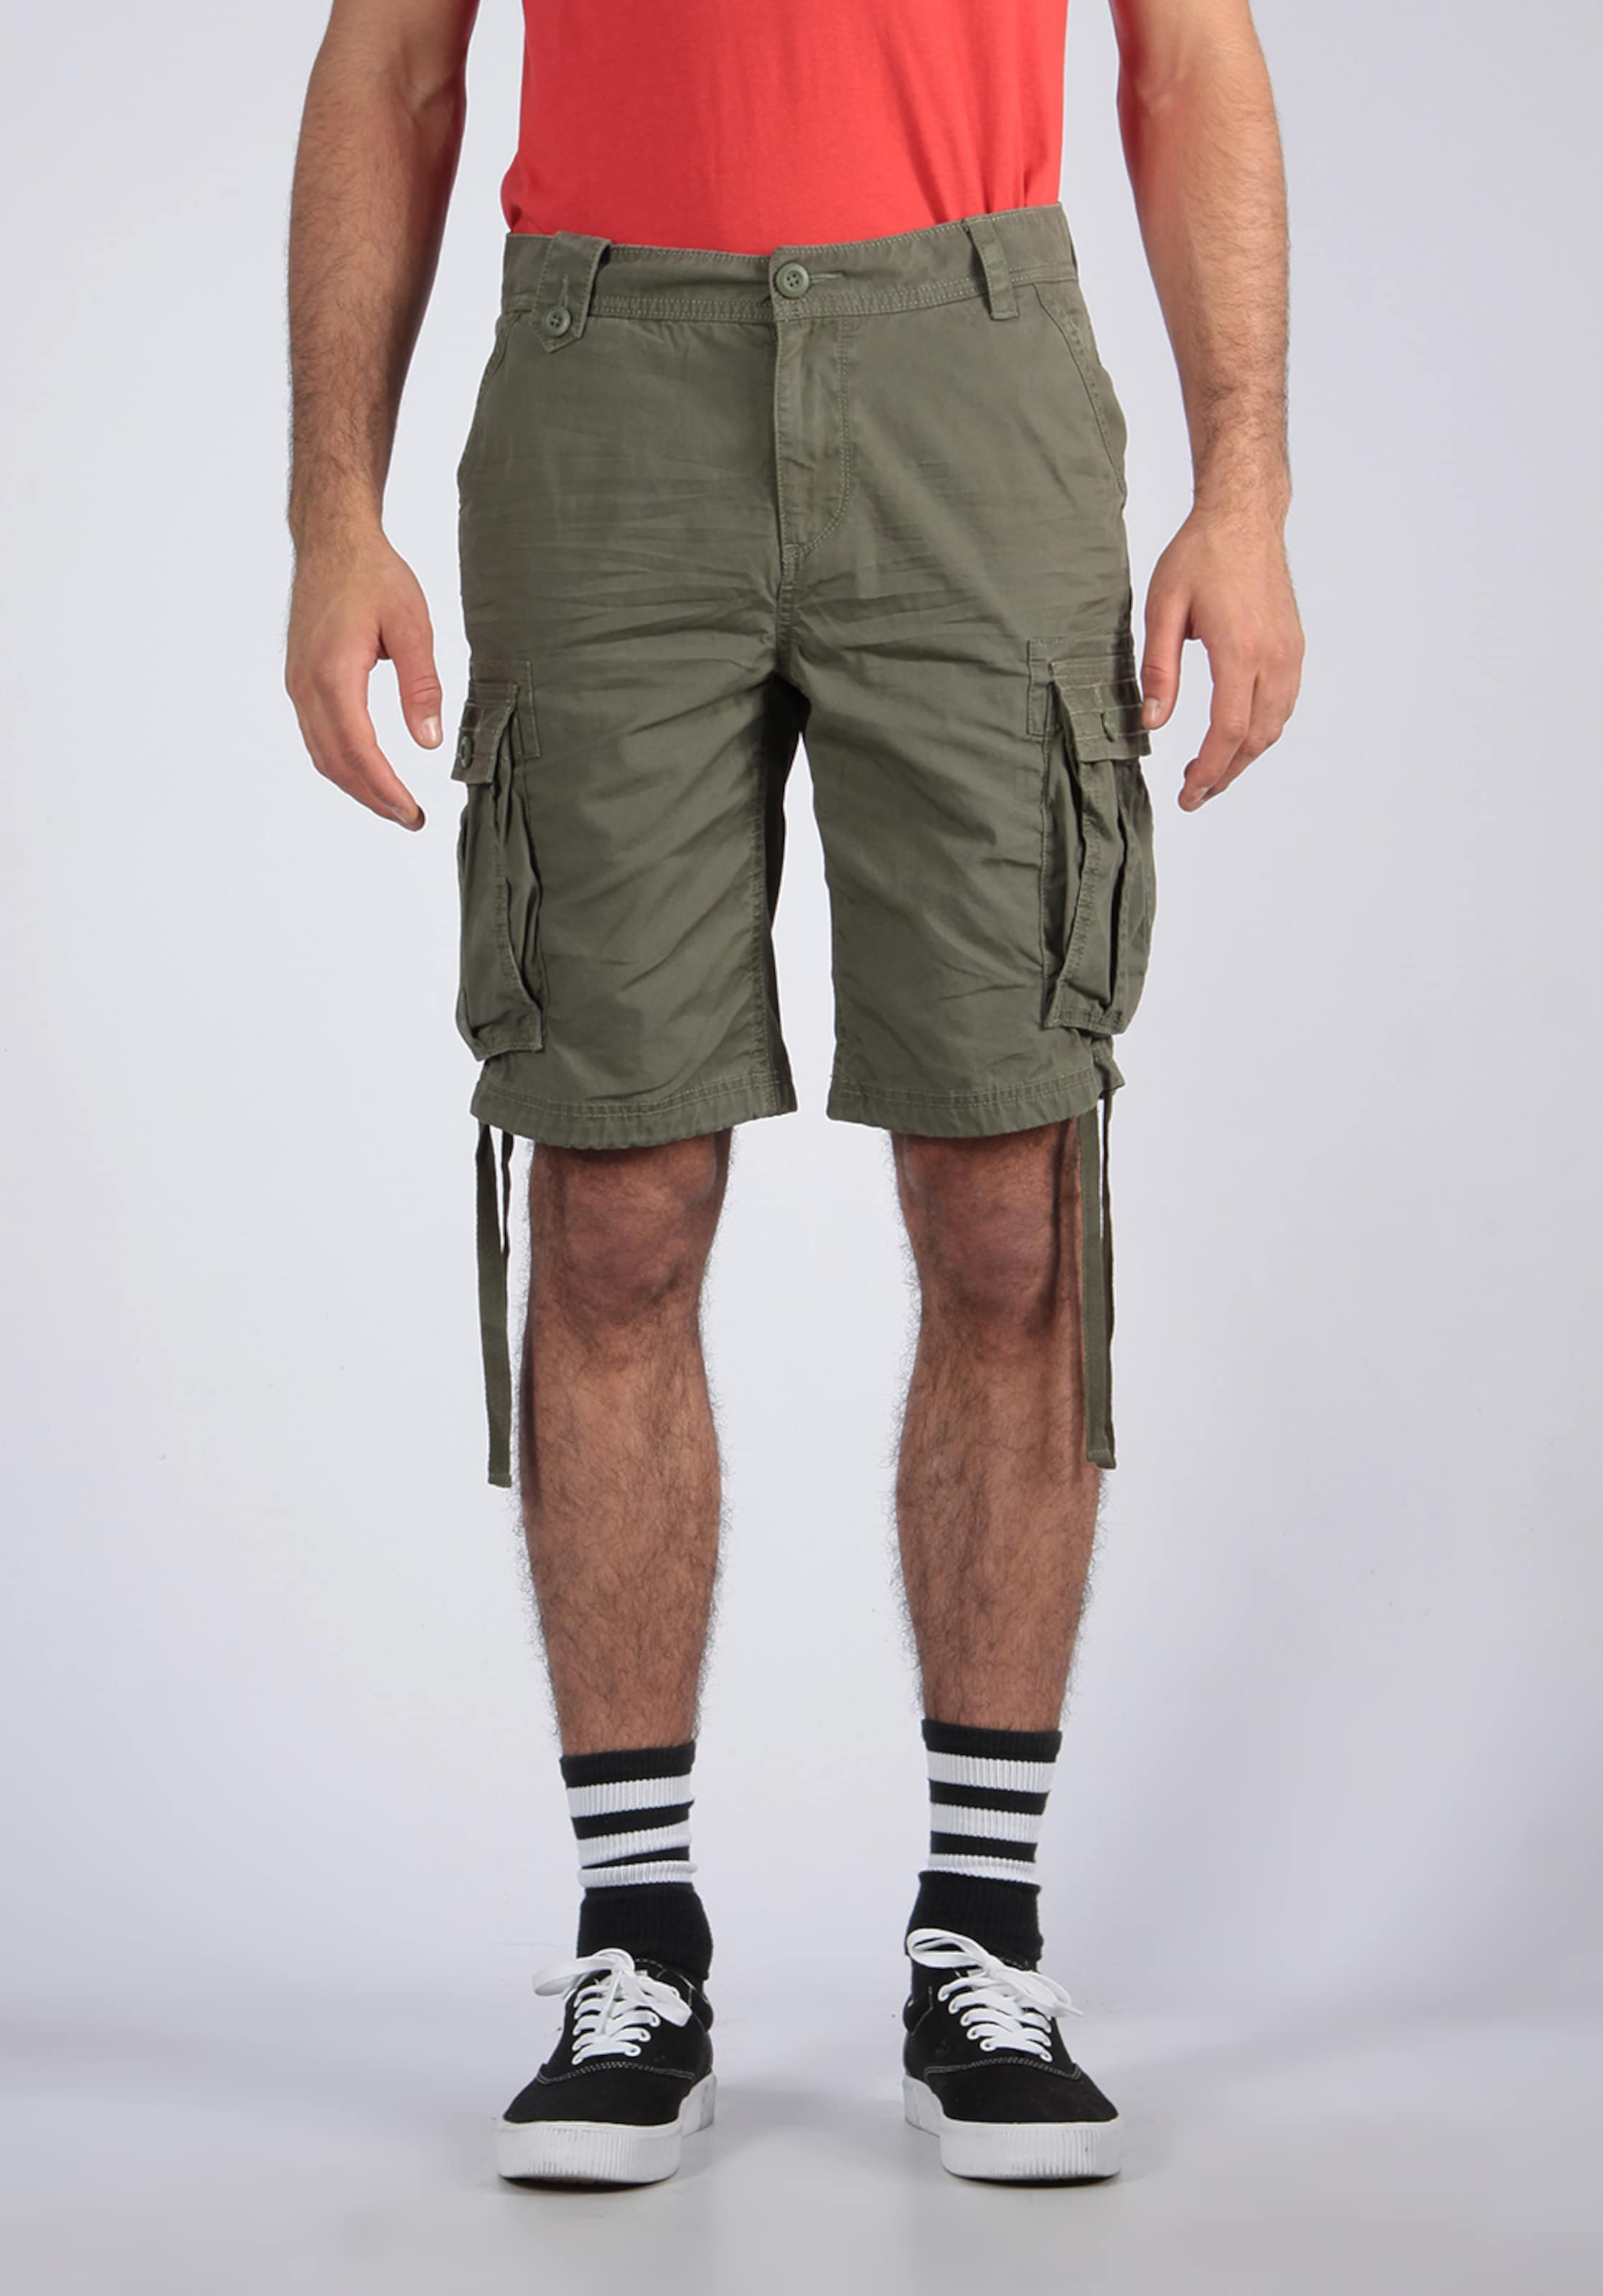 'korge' Shorts Kaporal Khaki Kaporal In 13KTlFJc